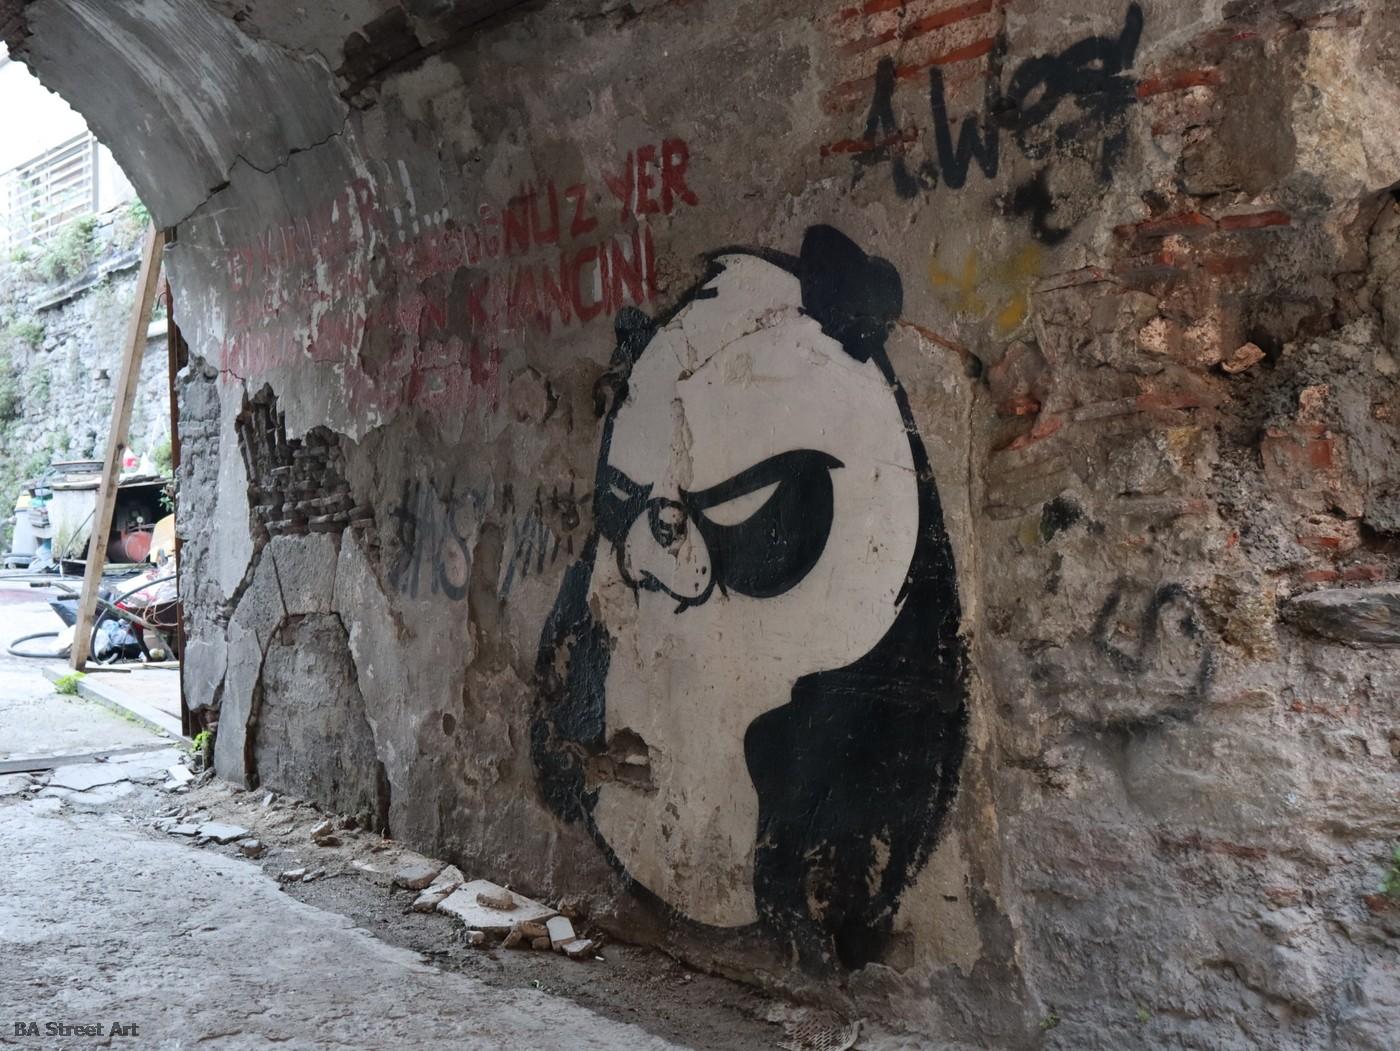 panda street art leo lunatic istanbul turkey graffiti urban art festival karakoy buenosairesstreetart.com